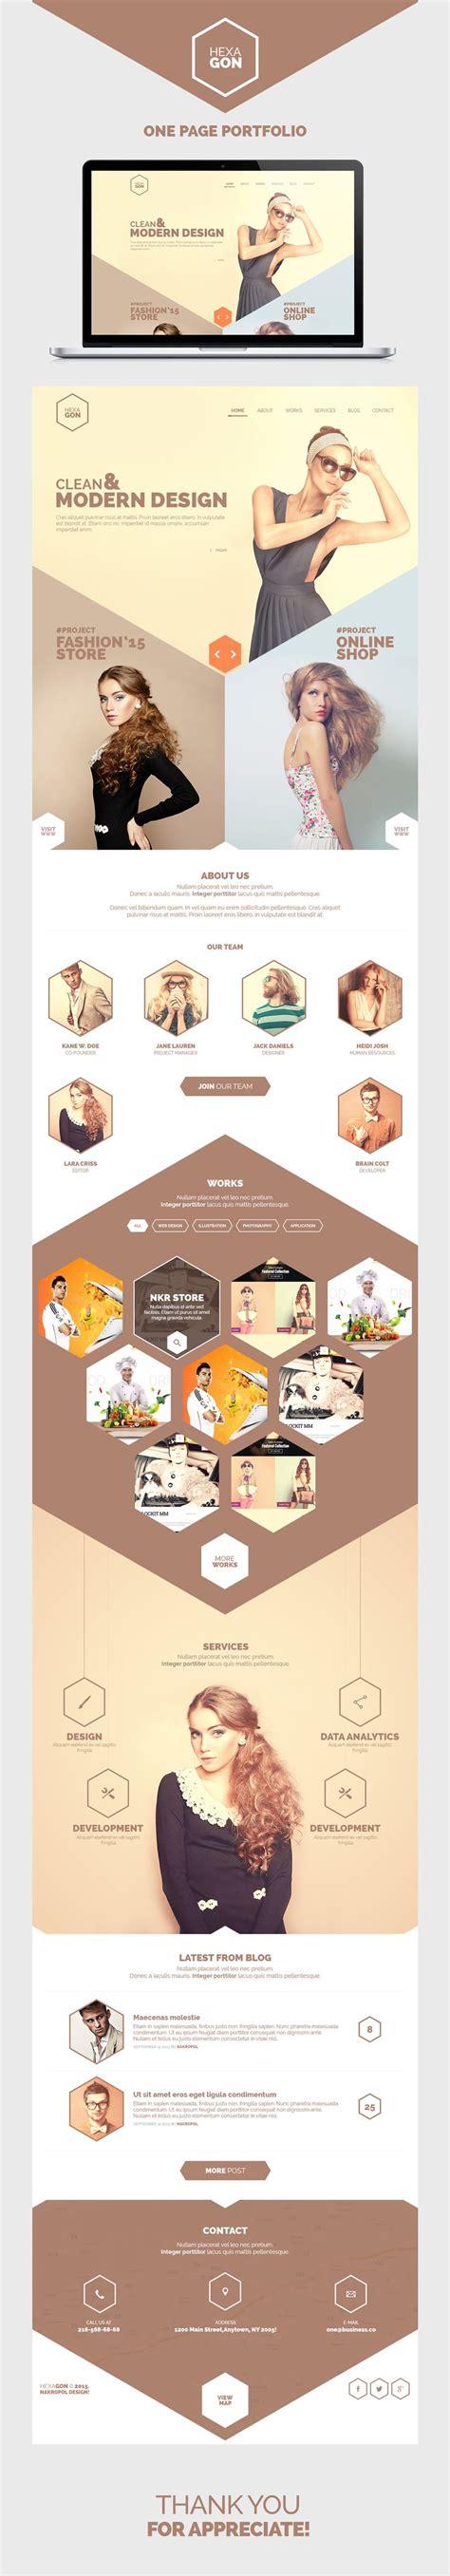 Best 25 Senior Ads Ideas On Pinterest Senior Yearbook Ideas Senior Yearbook Ads And Senior Hexagon Website Template